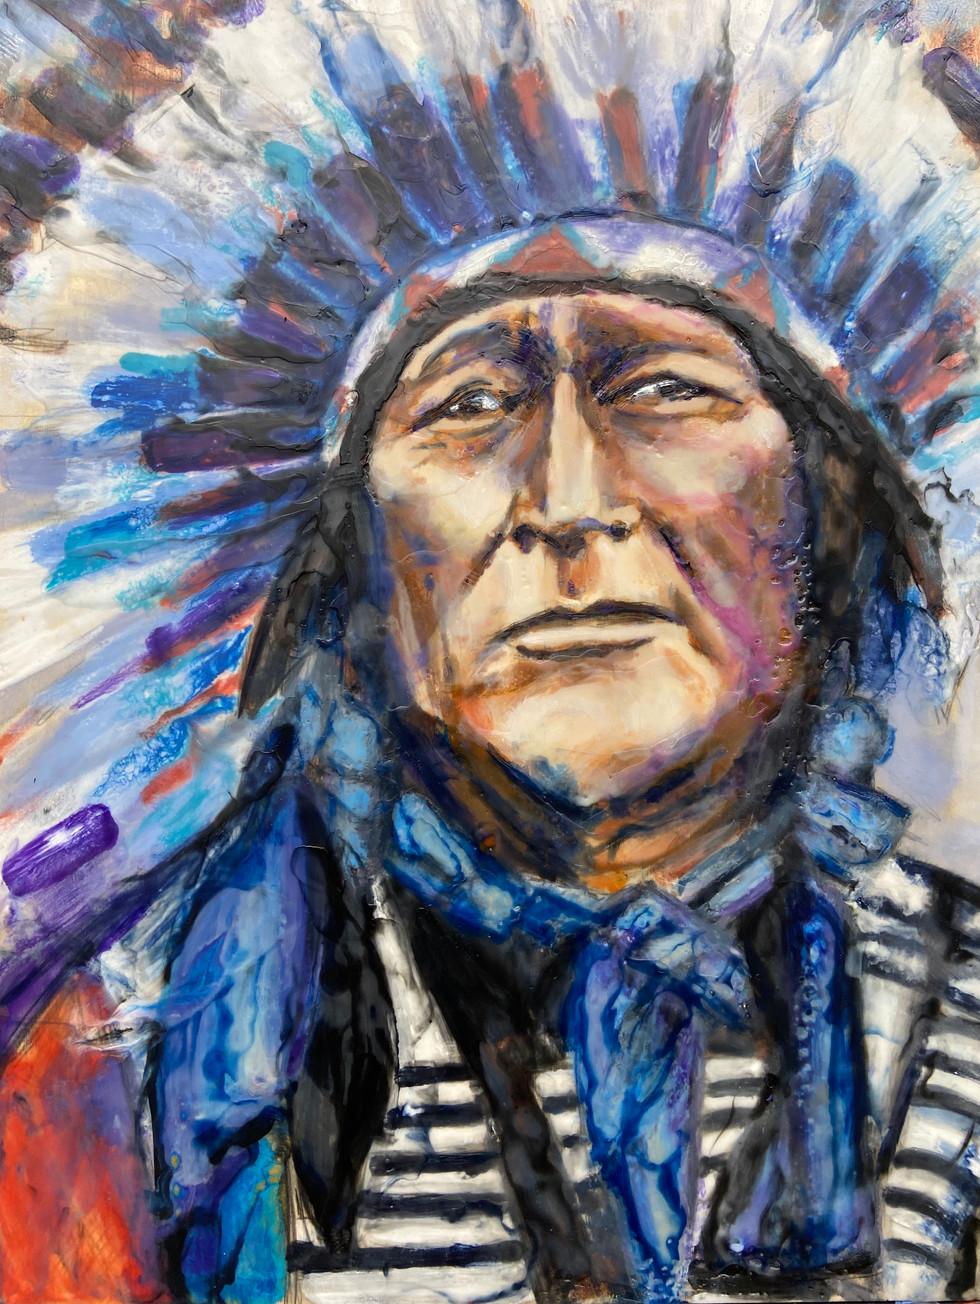 Chief Iron Shell, Encaustic wax portrait, 16x20, alison fullerton art